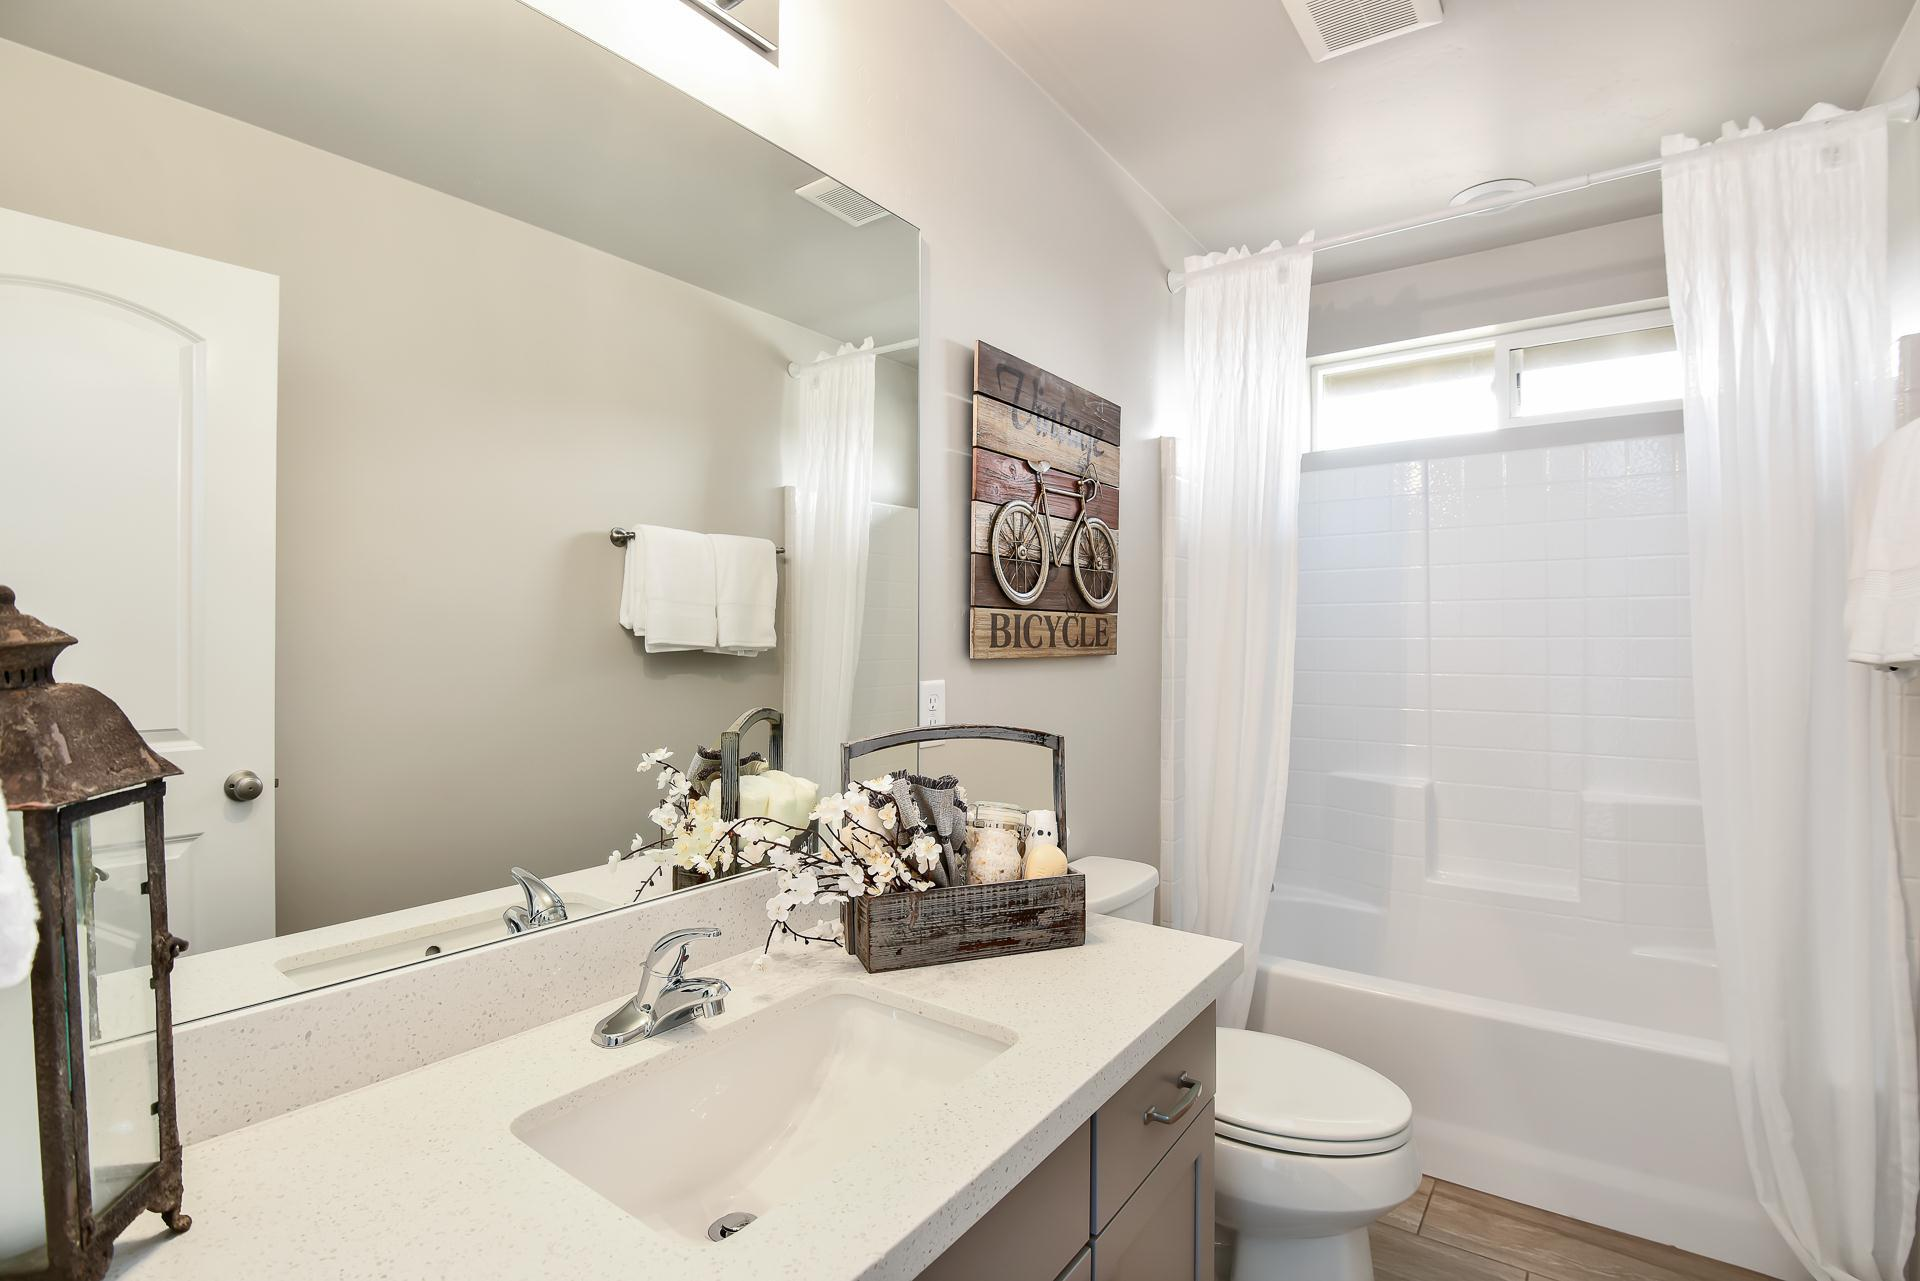 Bathroom featured in the Flagstaff Meadows Plan 2090 By Capstone Homes in Flagstaff, AZ